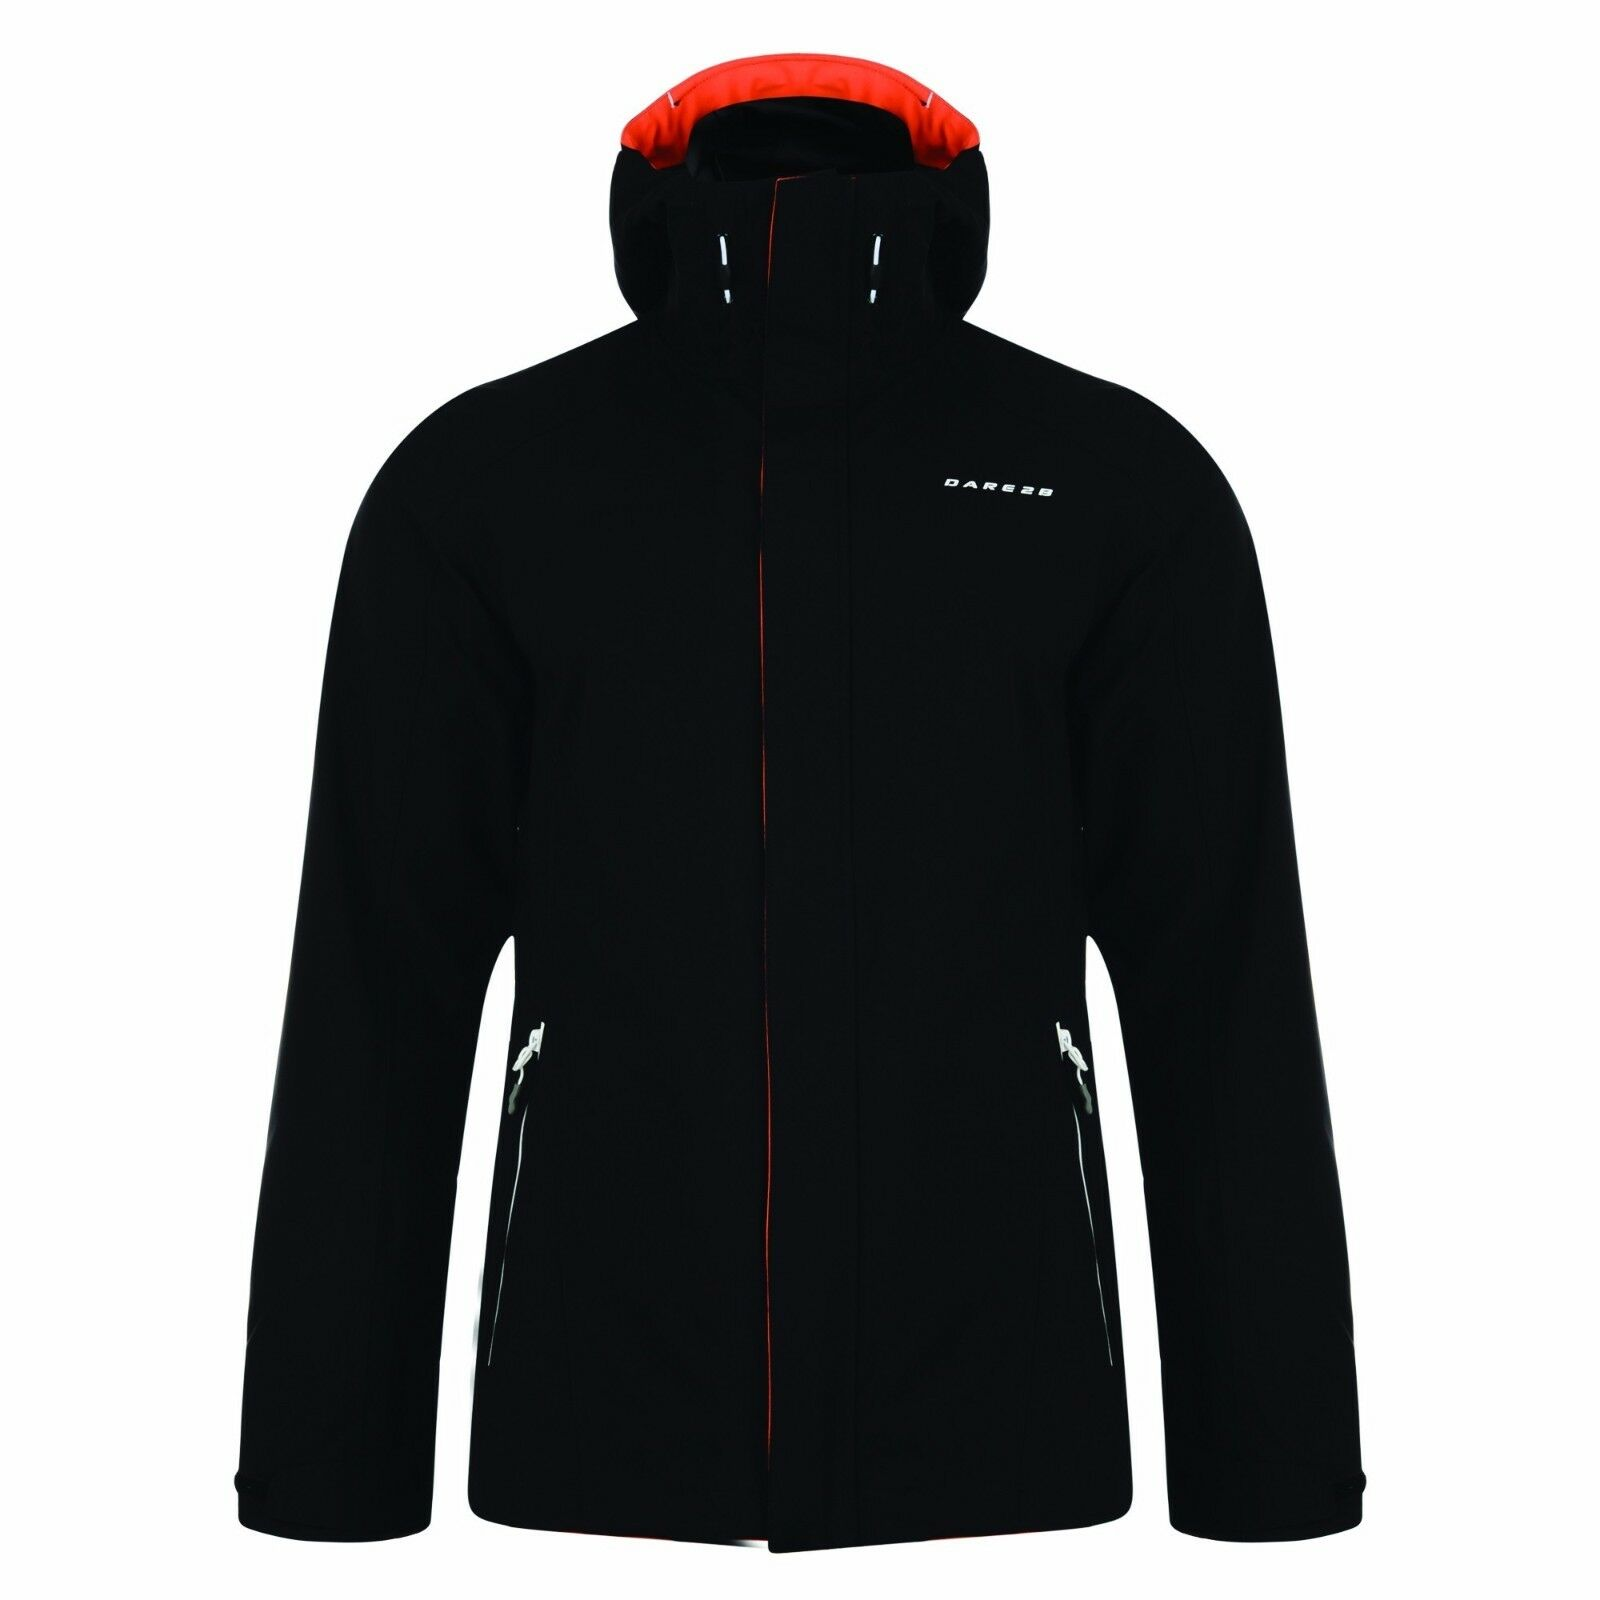 Dare 2b provision Jacket señores Funktions chaqueta transpirable leer